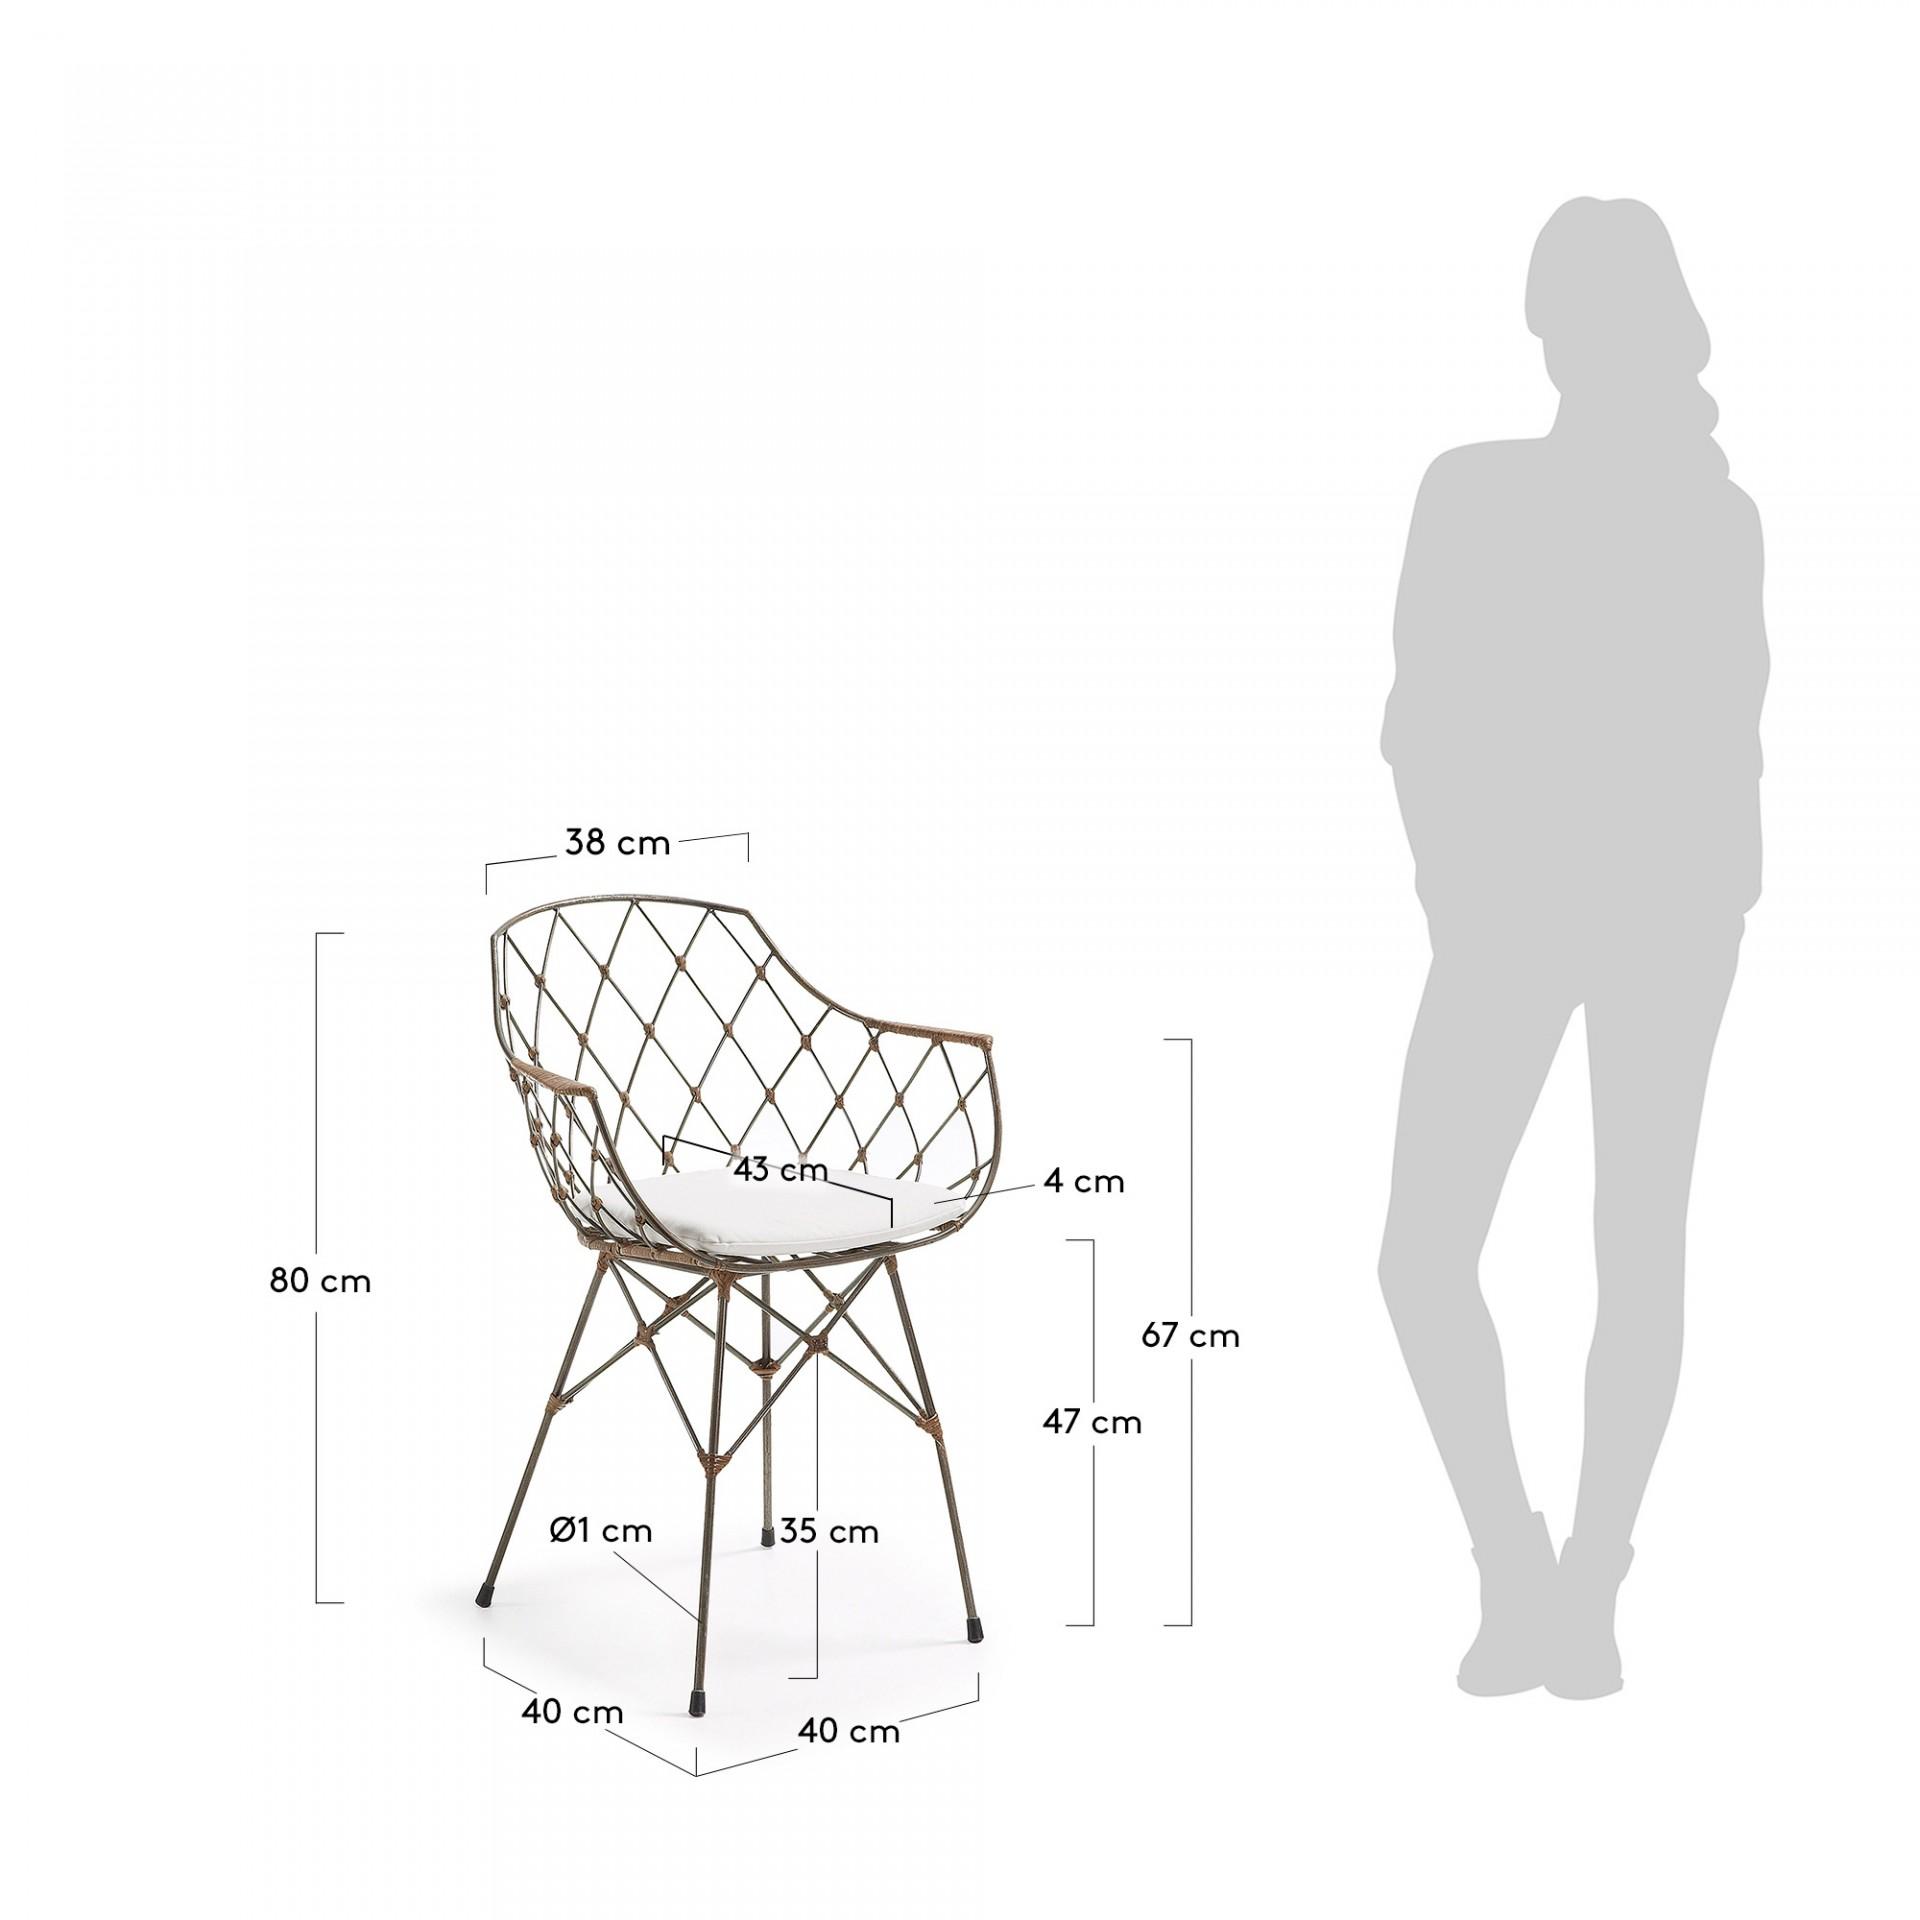 Cadeira Lux em metal/rattan, c/almofada